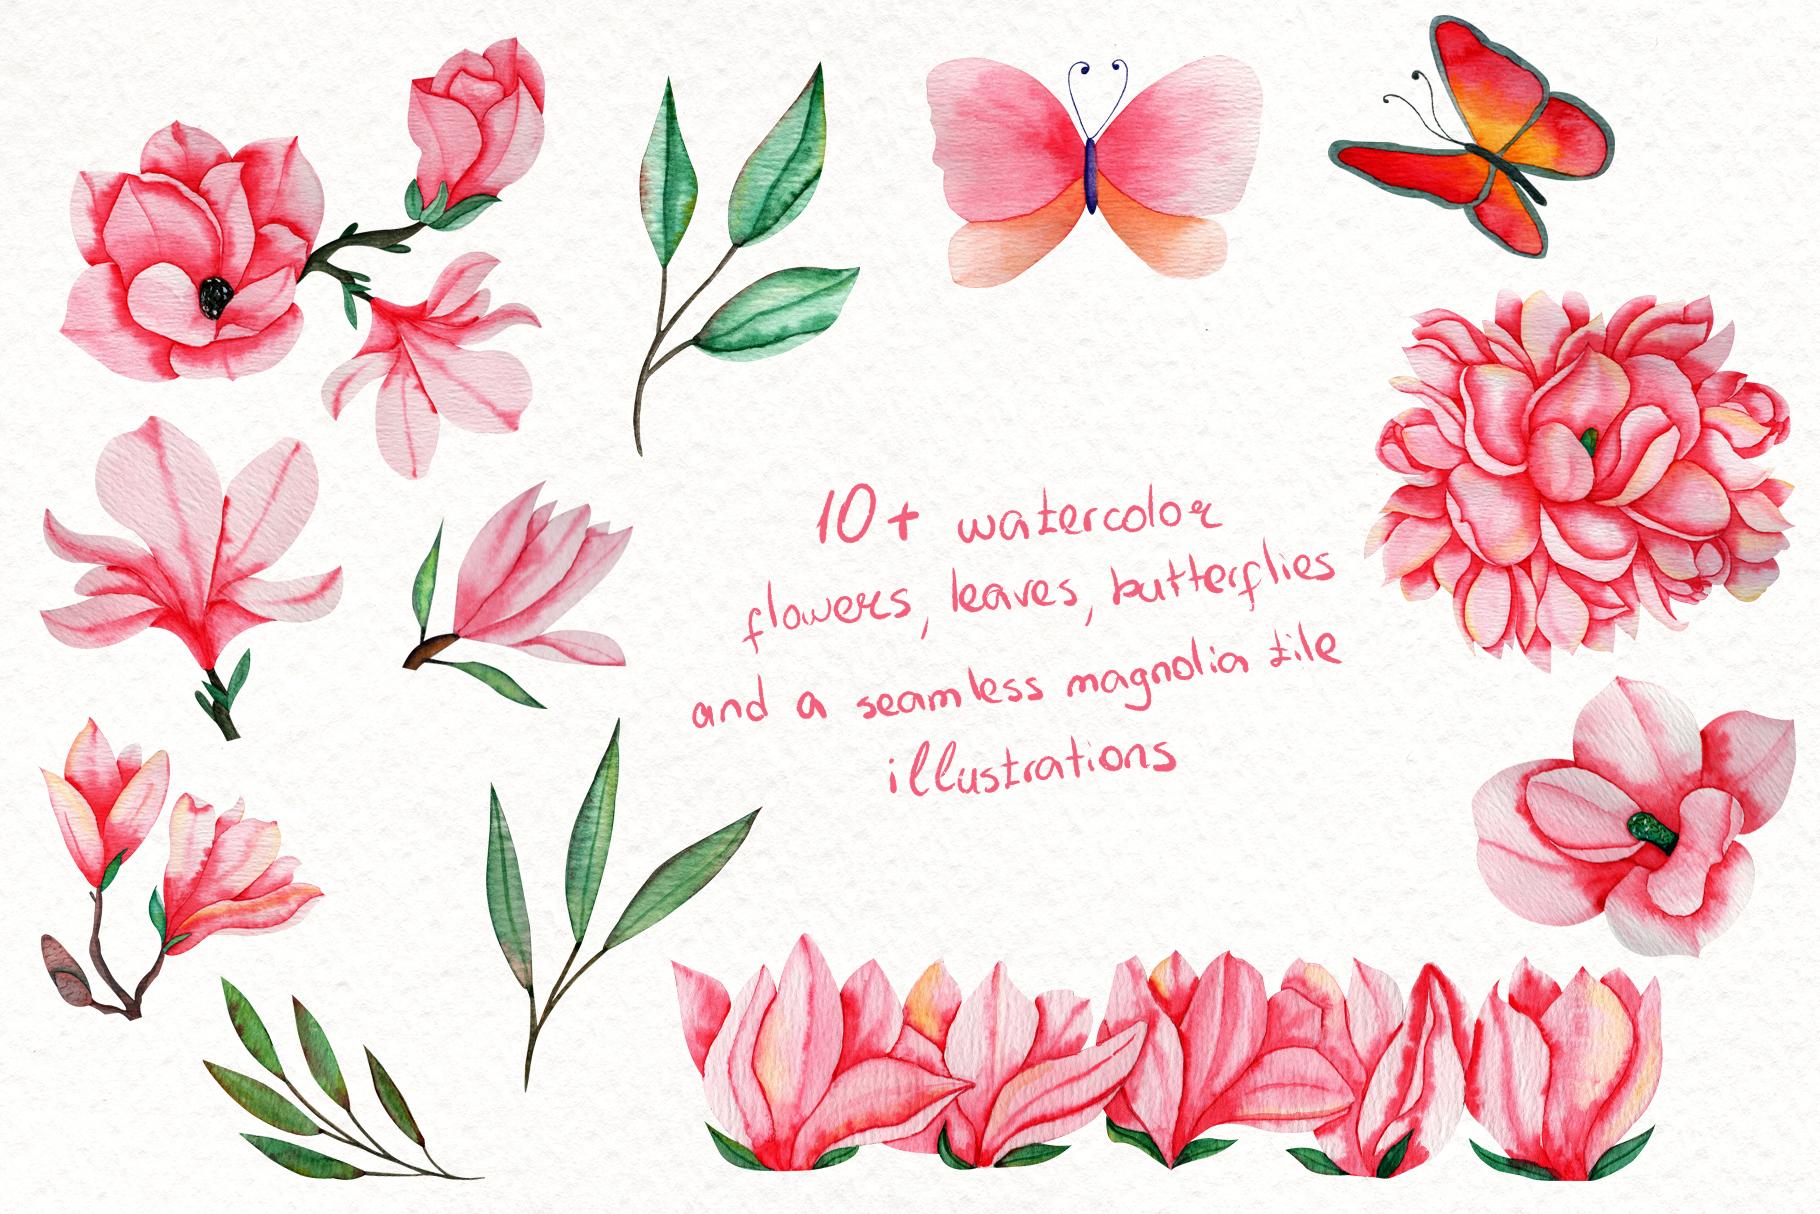 Magnolia Dream - Watercolor Illustrations example image 3